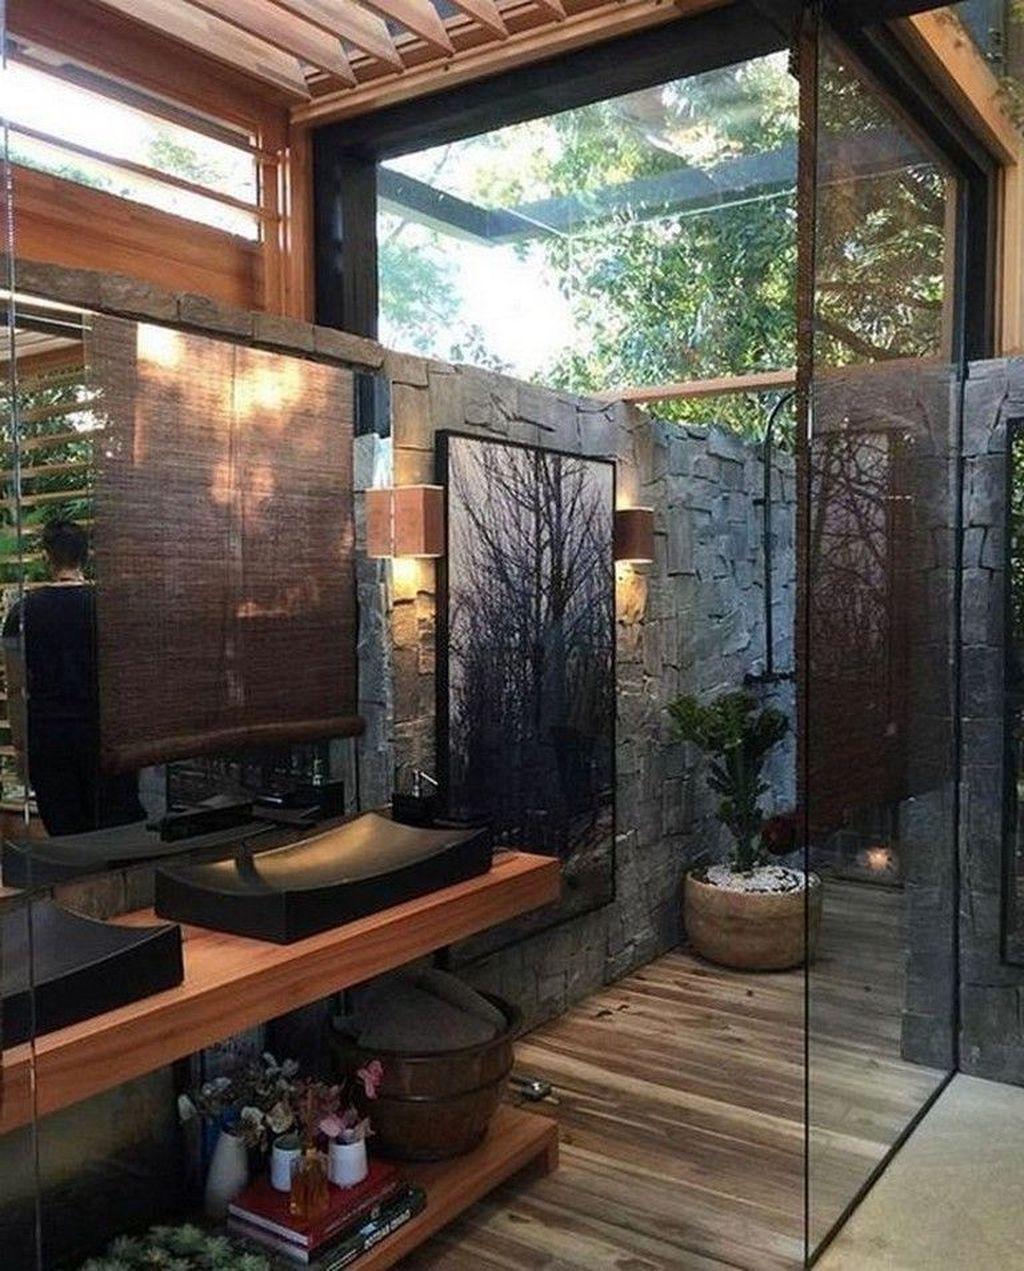 Creative Outdoor Bathroom Design Ideas For Enjoying Summer 23